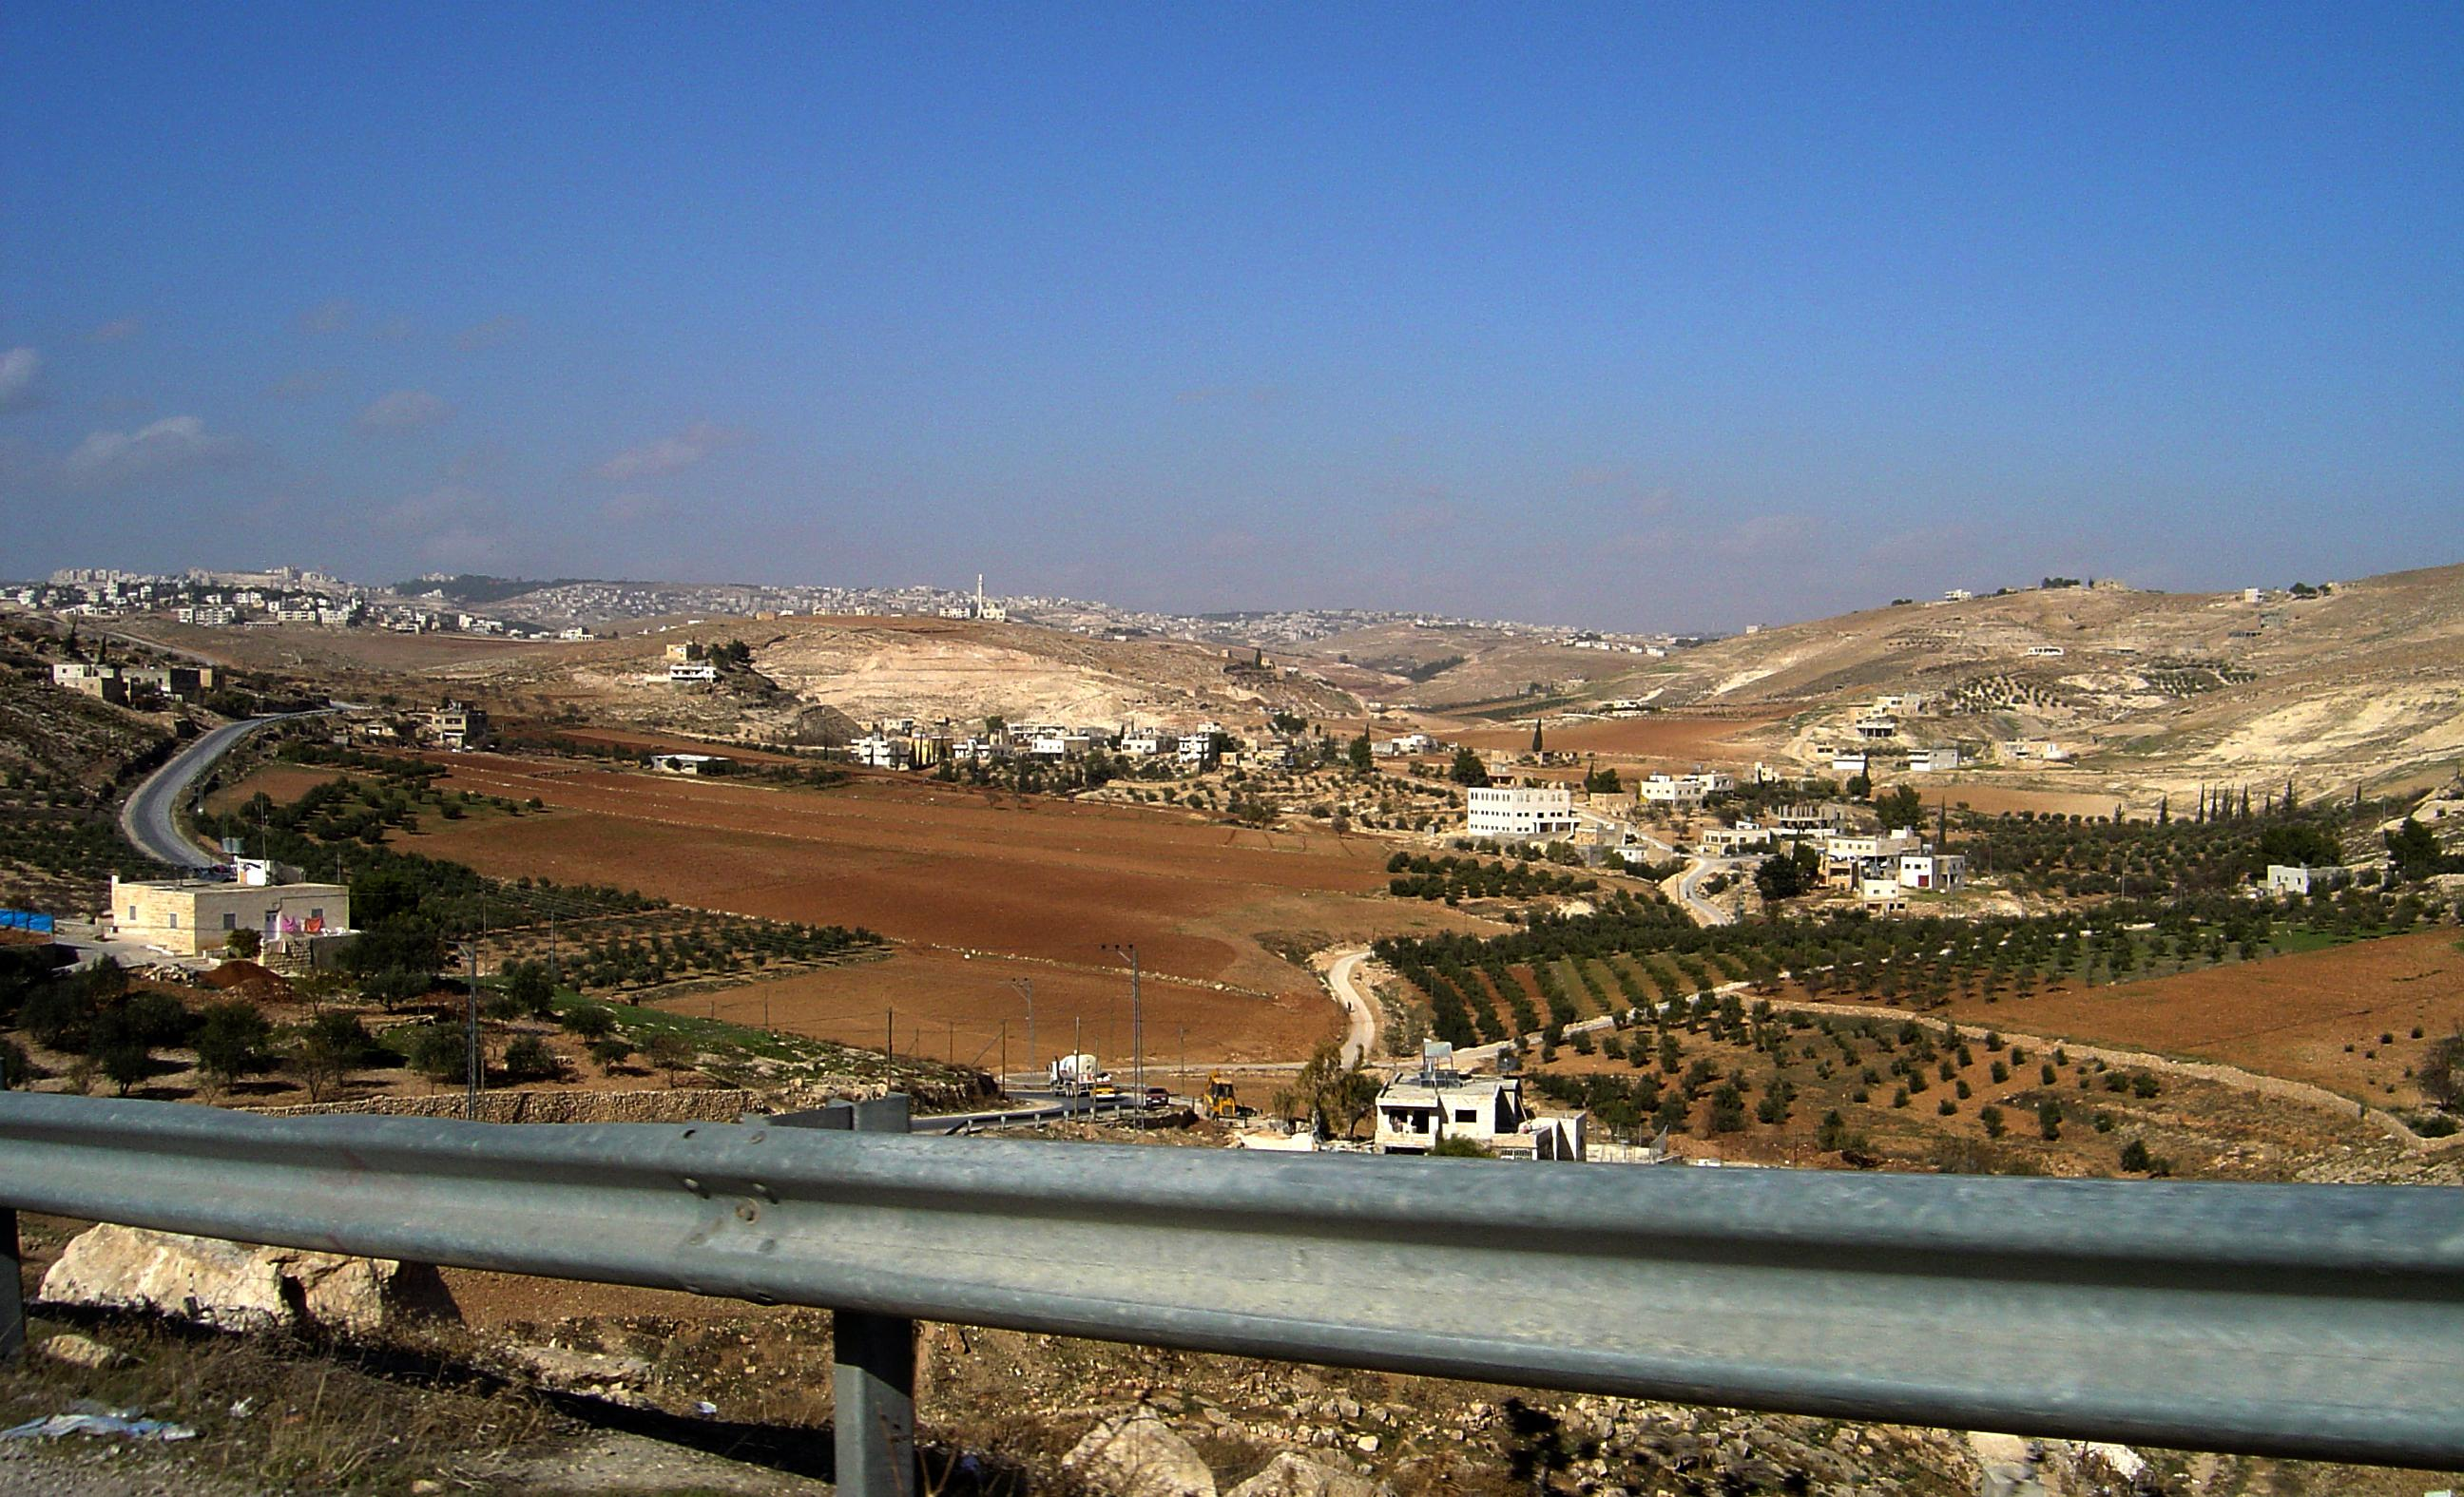 Bethlehem-بيت لحم: منظر عام للمدينة من الجهة الجنوبية الغربية